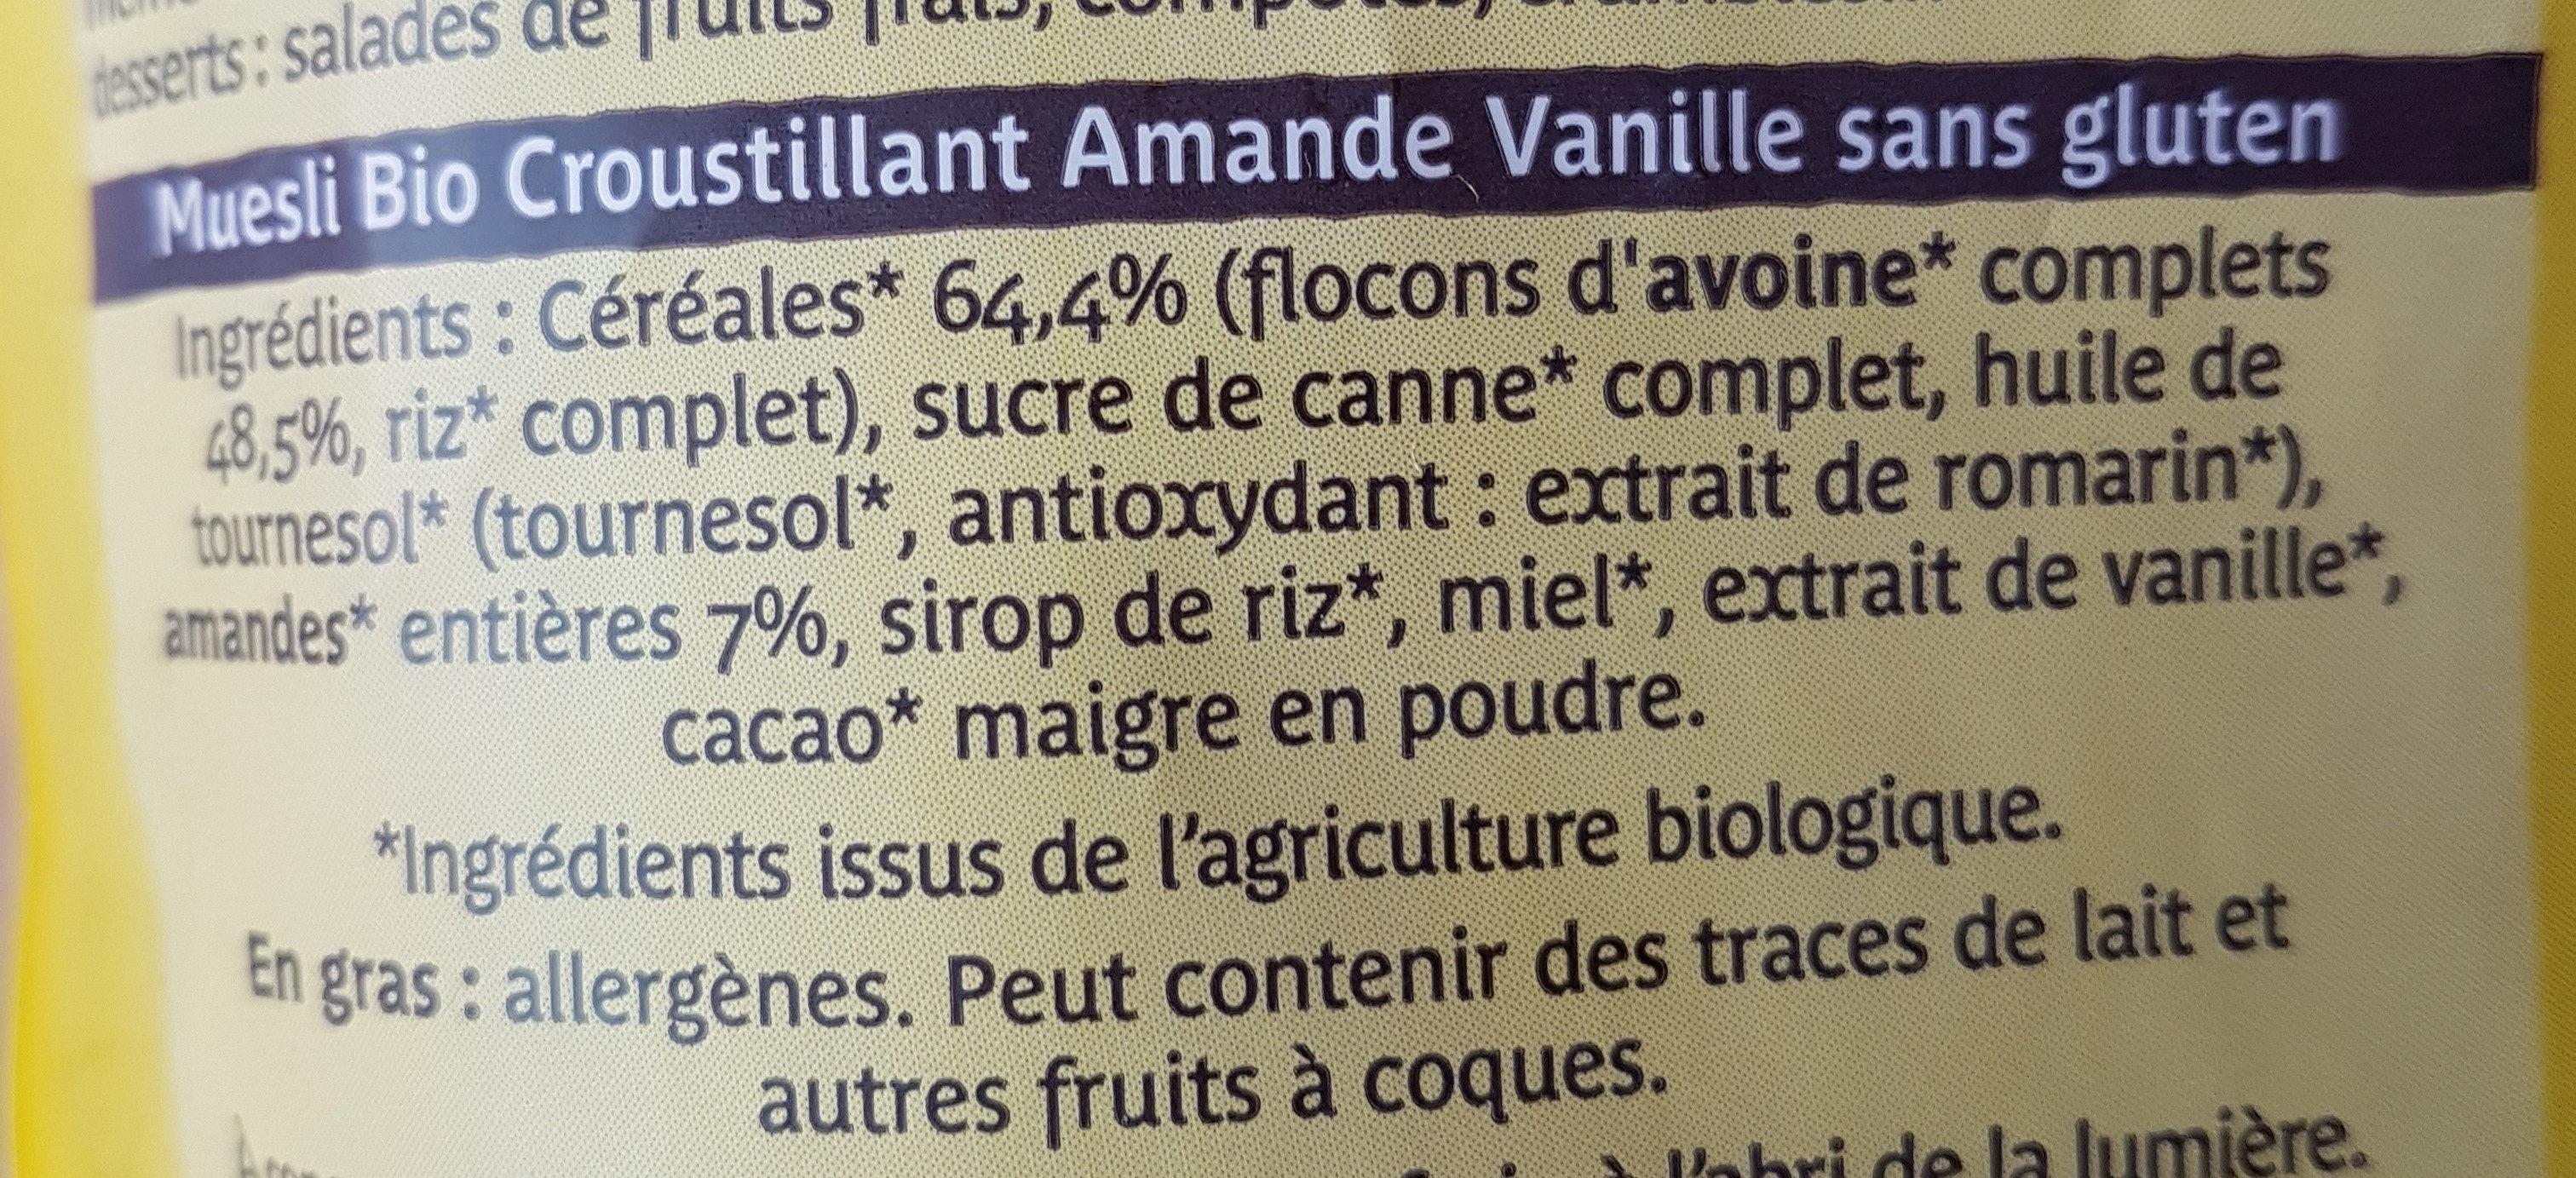 Muesli bio croustillant amande vanille - Ingrédients